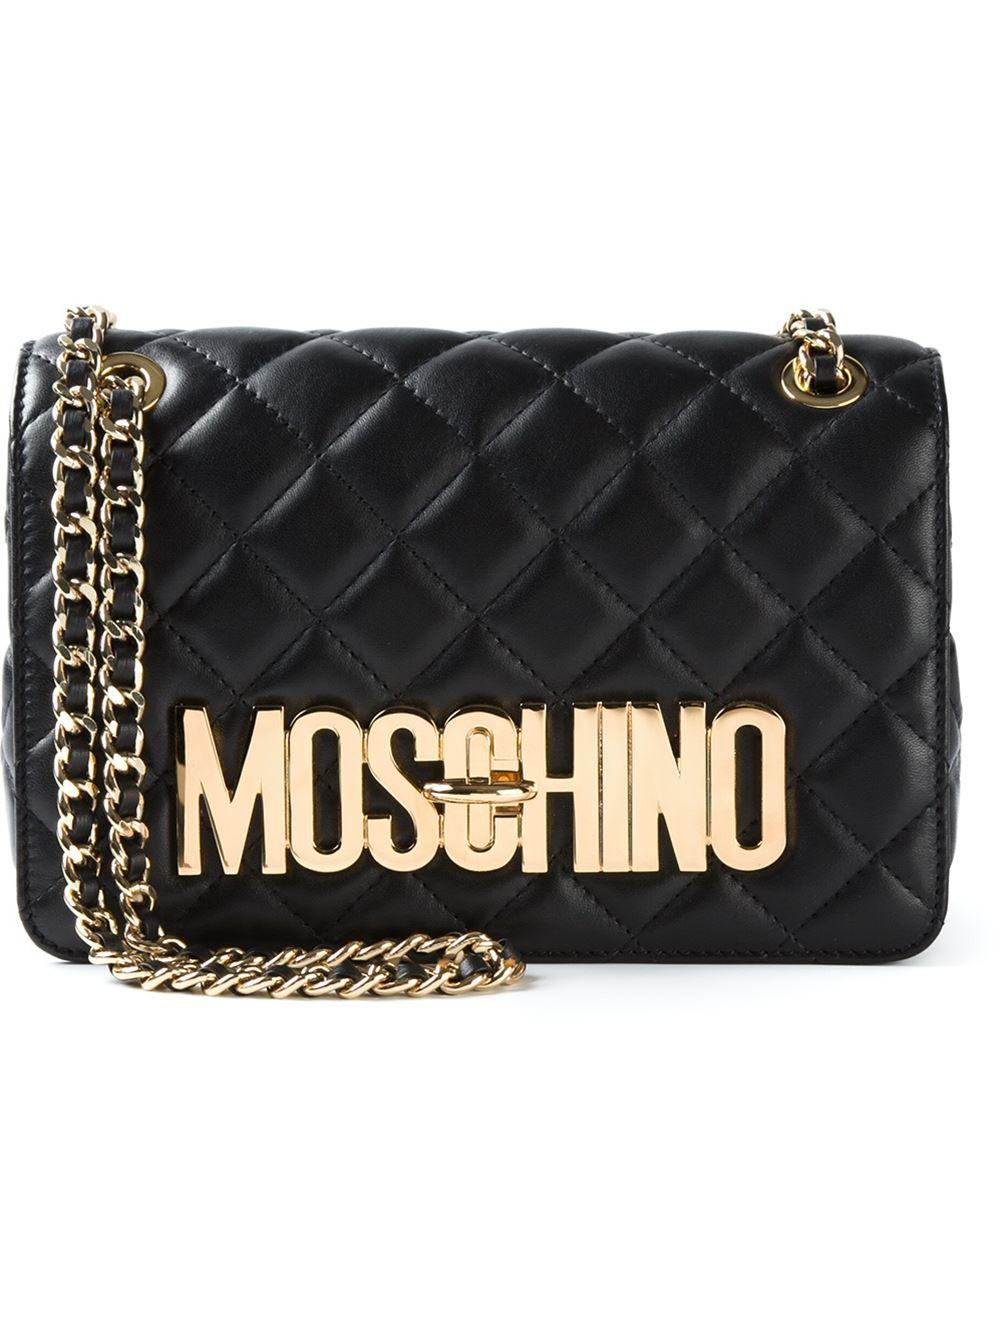 Moschino Quilted Sheepskin Shoulder Bag In Black Lyst